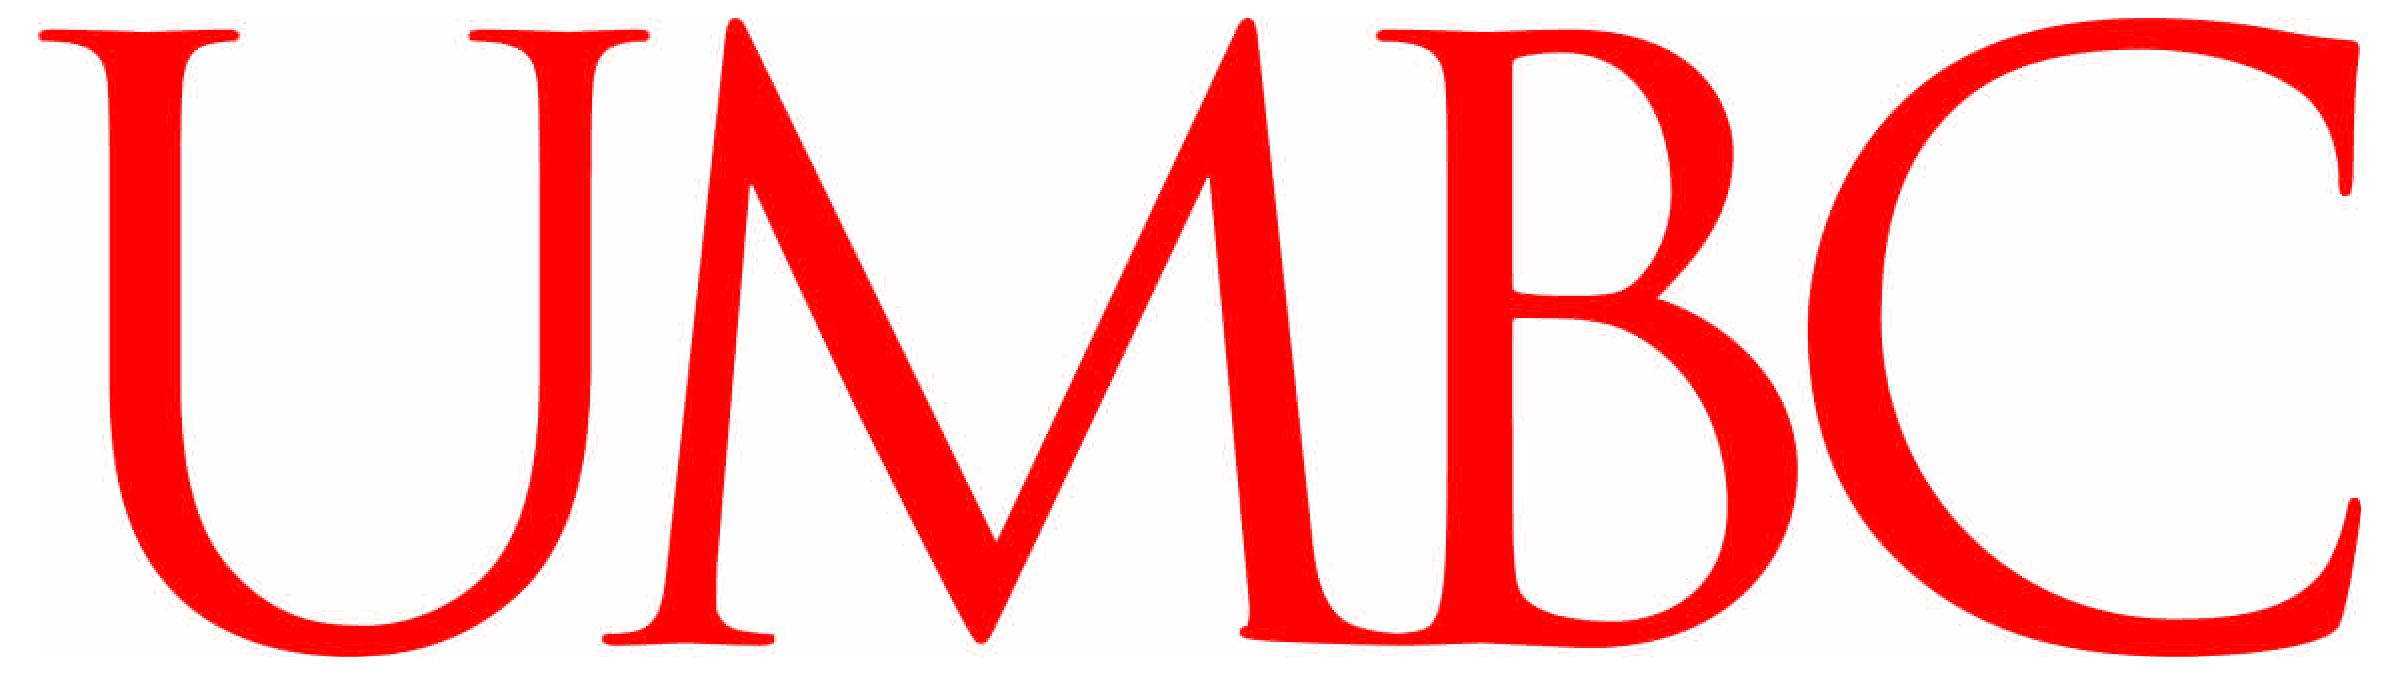 UMBC-no-tagline-red.jpg